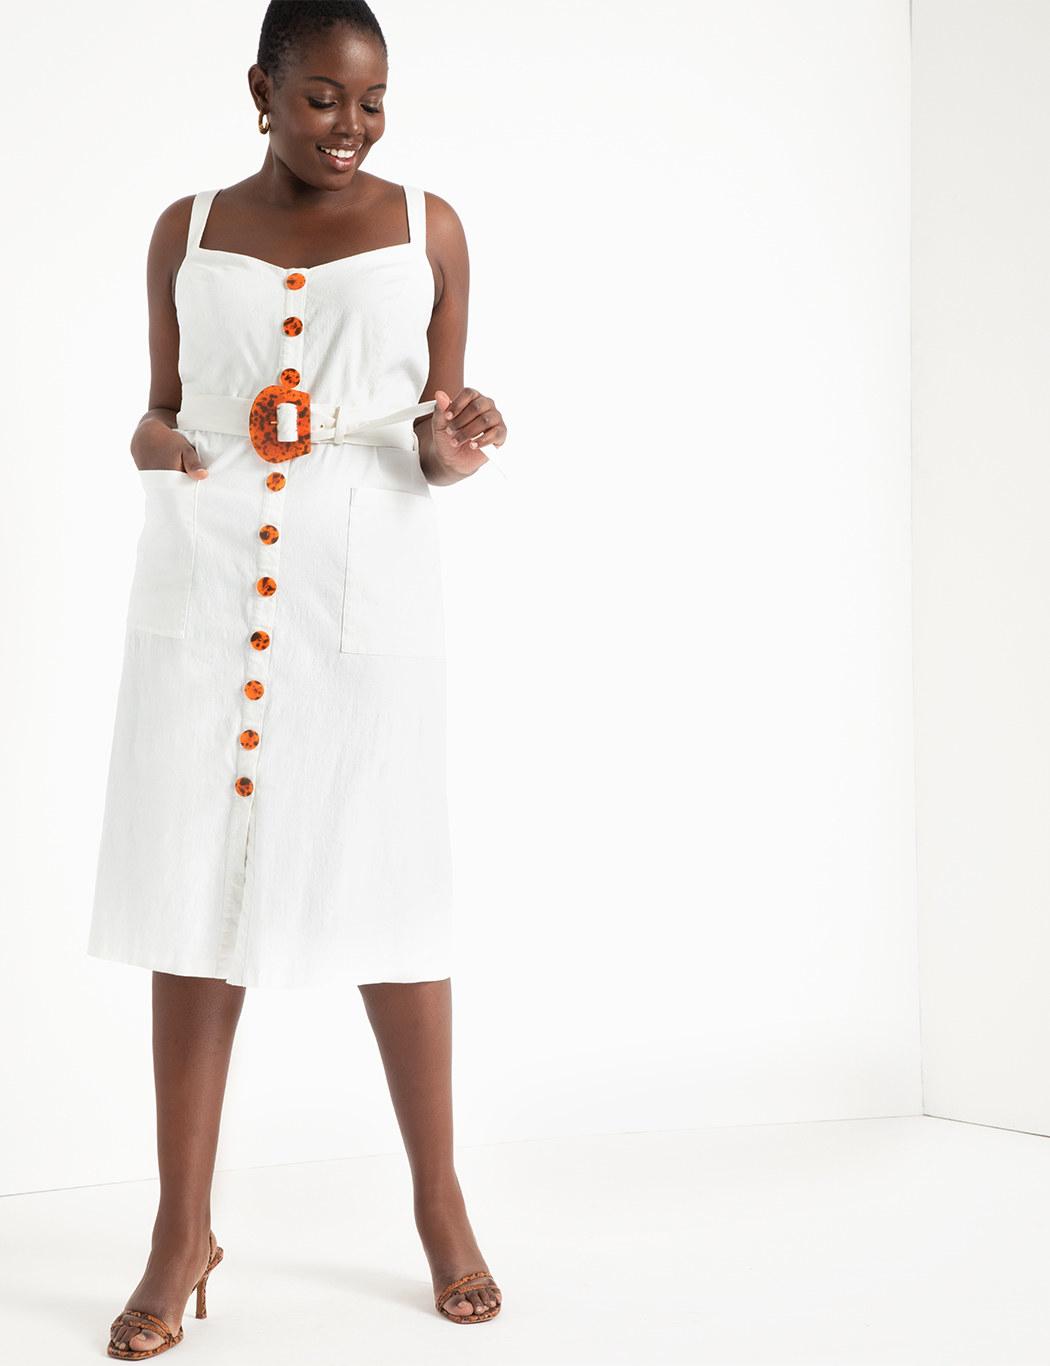 model wearing the white midi dress